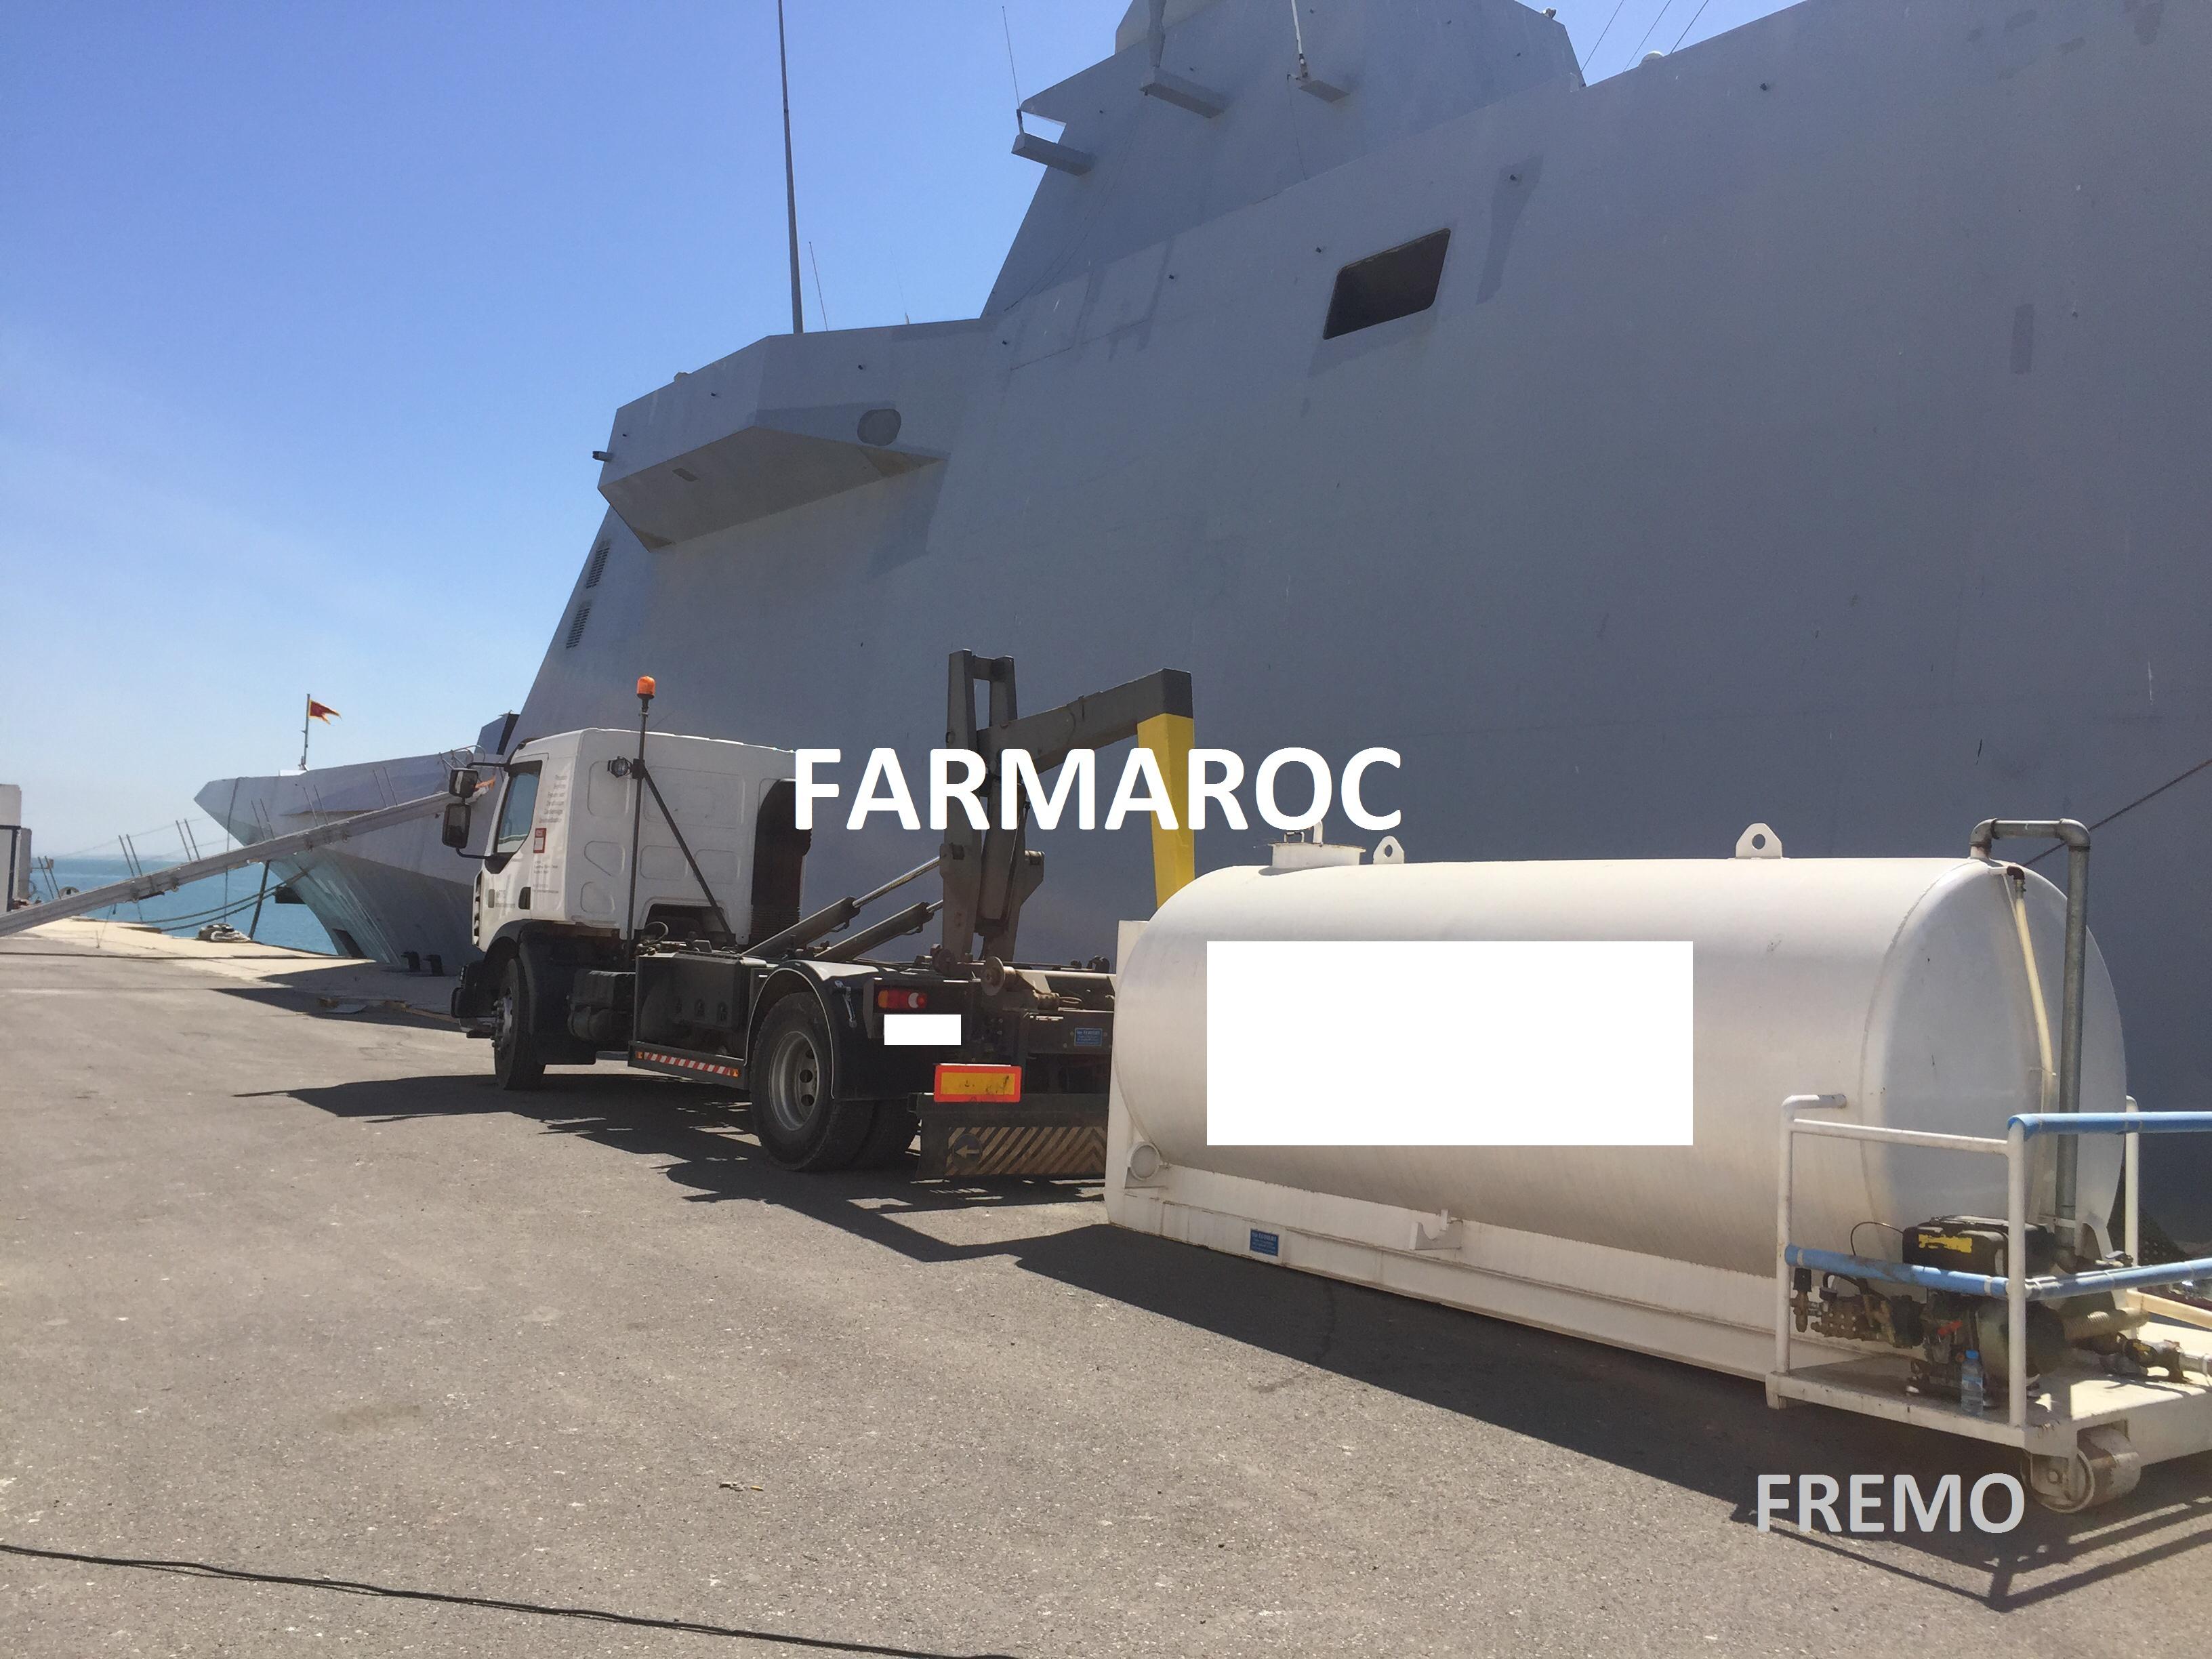 Royal Moroccan Navy FREMM Frigate / FREMM Marocaine - Mohammed VI - Page 13 33160768998_9b61274dc8_o